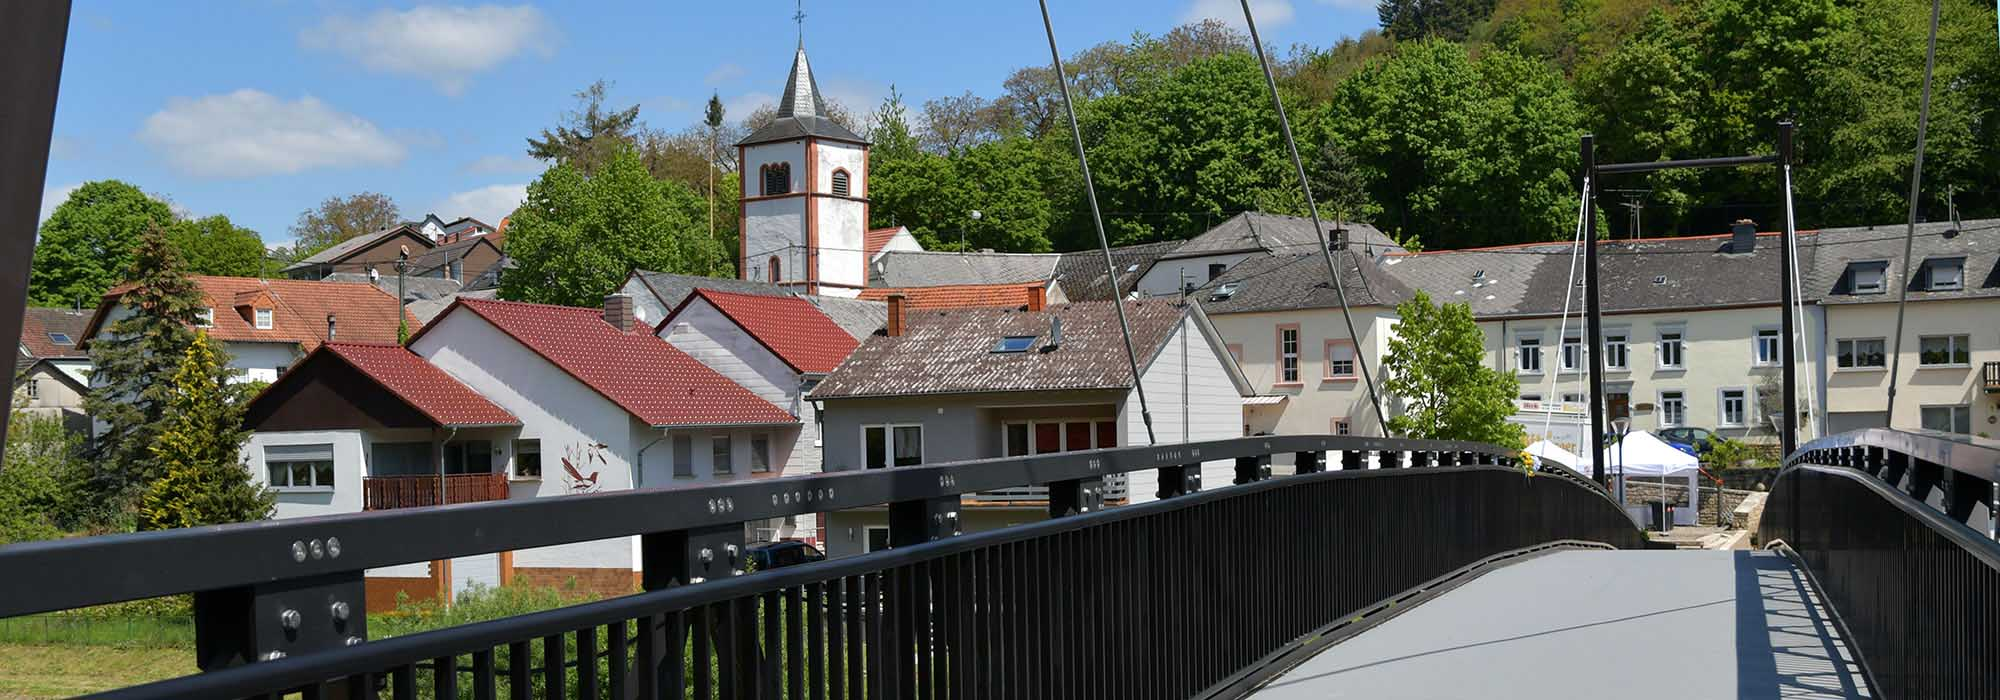 ARN_2015-sauertal-Metztdorf